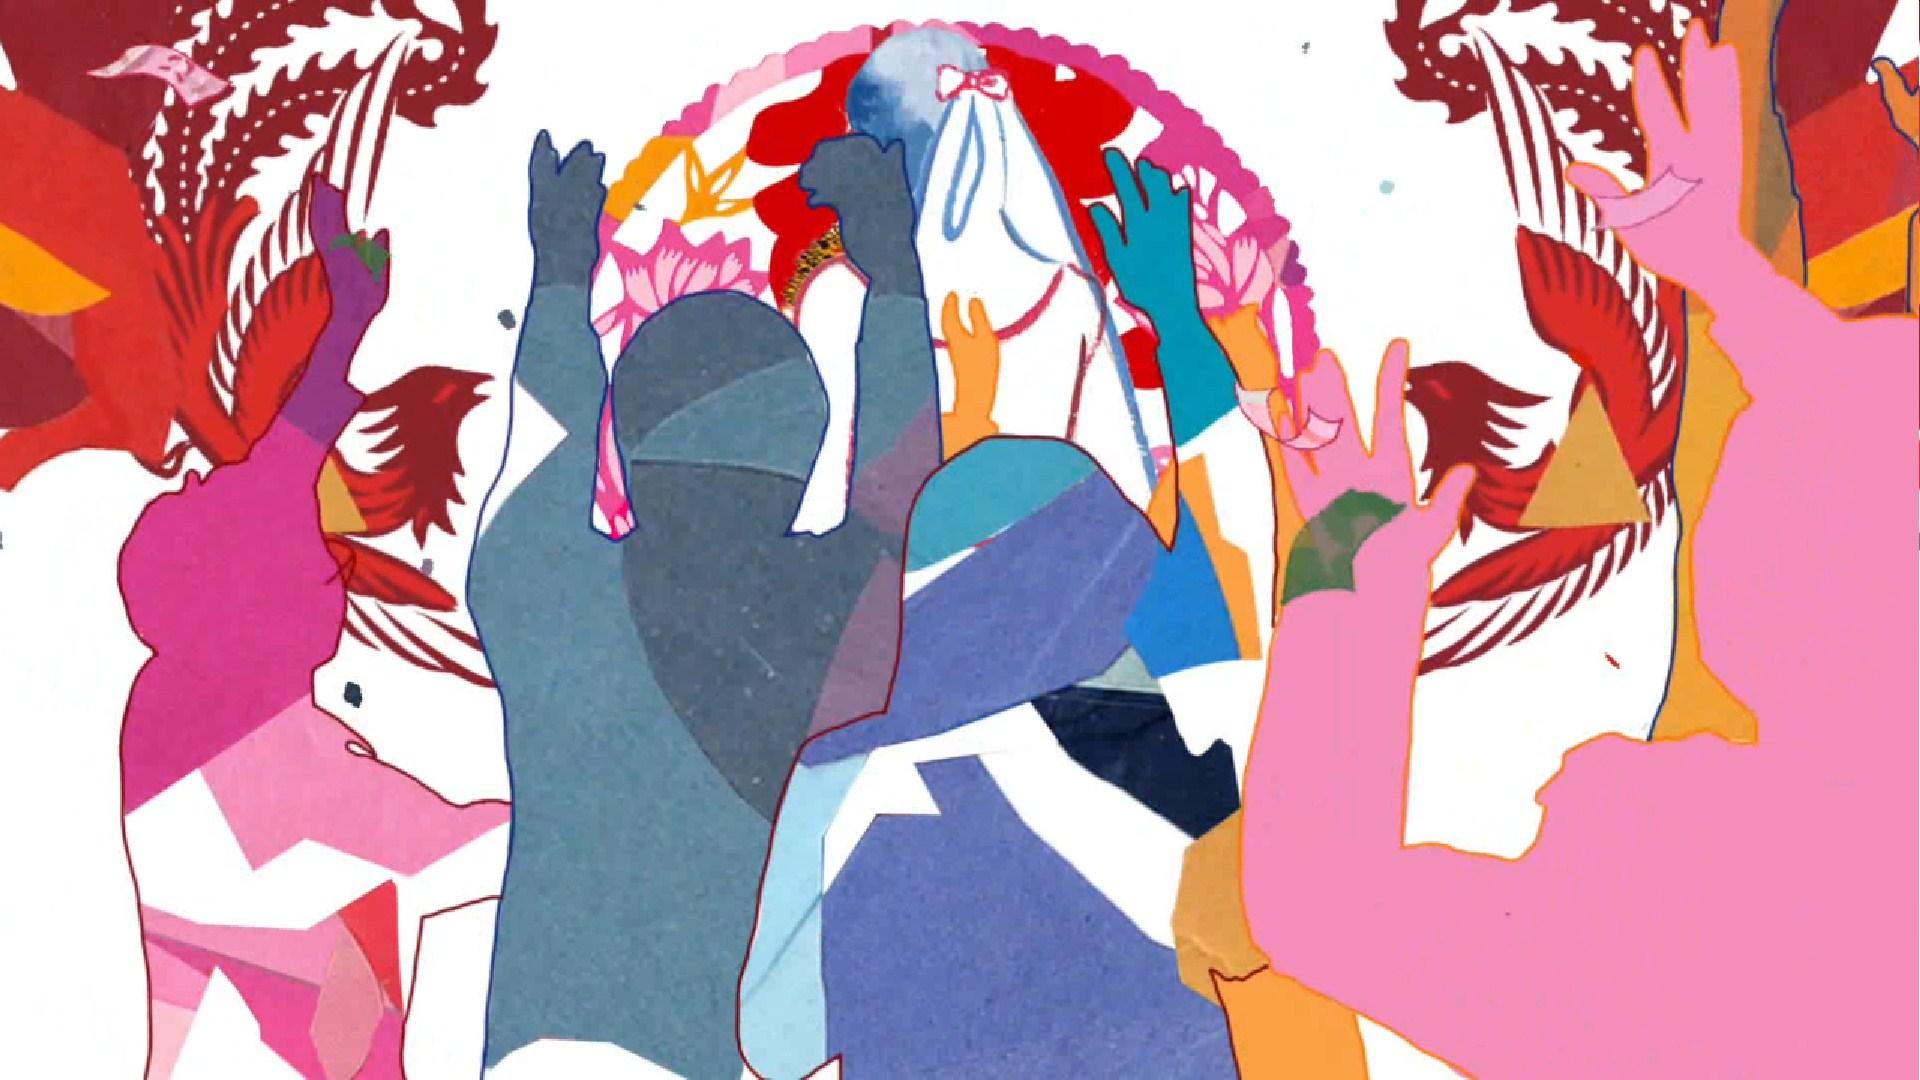 - 作品名称:《荒诞祭》导演:李昂联合导演:蔡采贝、黄星智制片:龙娟娟国家/地区:中国创作时间:2014 编剧:李昂、蔡采贝、黄星智美术:蔡采贝音乐:袁思翰片长:6分49秒Title: Ridiculous IllusionDirector: Li AngCo-Director(s): Cai Caibei, Huang Xingzhi Producer: Long Juanjuan Country/Area: ChinaYear of Production: 2014 Screenplay: Li Ang, Cai Caibei, Huang Xingzhi Design: Cai Caibei Music: Yuan Sihan Length: 6 mins 49 secs作品介绍四段故事,从不同的生活点来表达一个共同的主题——荒诞。榴莲,最优秀的手捧花。开往极地的列车。香烟流星雨。他人的葬礼。Synopsis Four episodes, all illustrate the same theme—absurdity, though in different angles.Durian, the best hand bouquet.The train leaving for the polar.Cigarette meteor shower.The funeral of someone else.